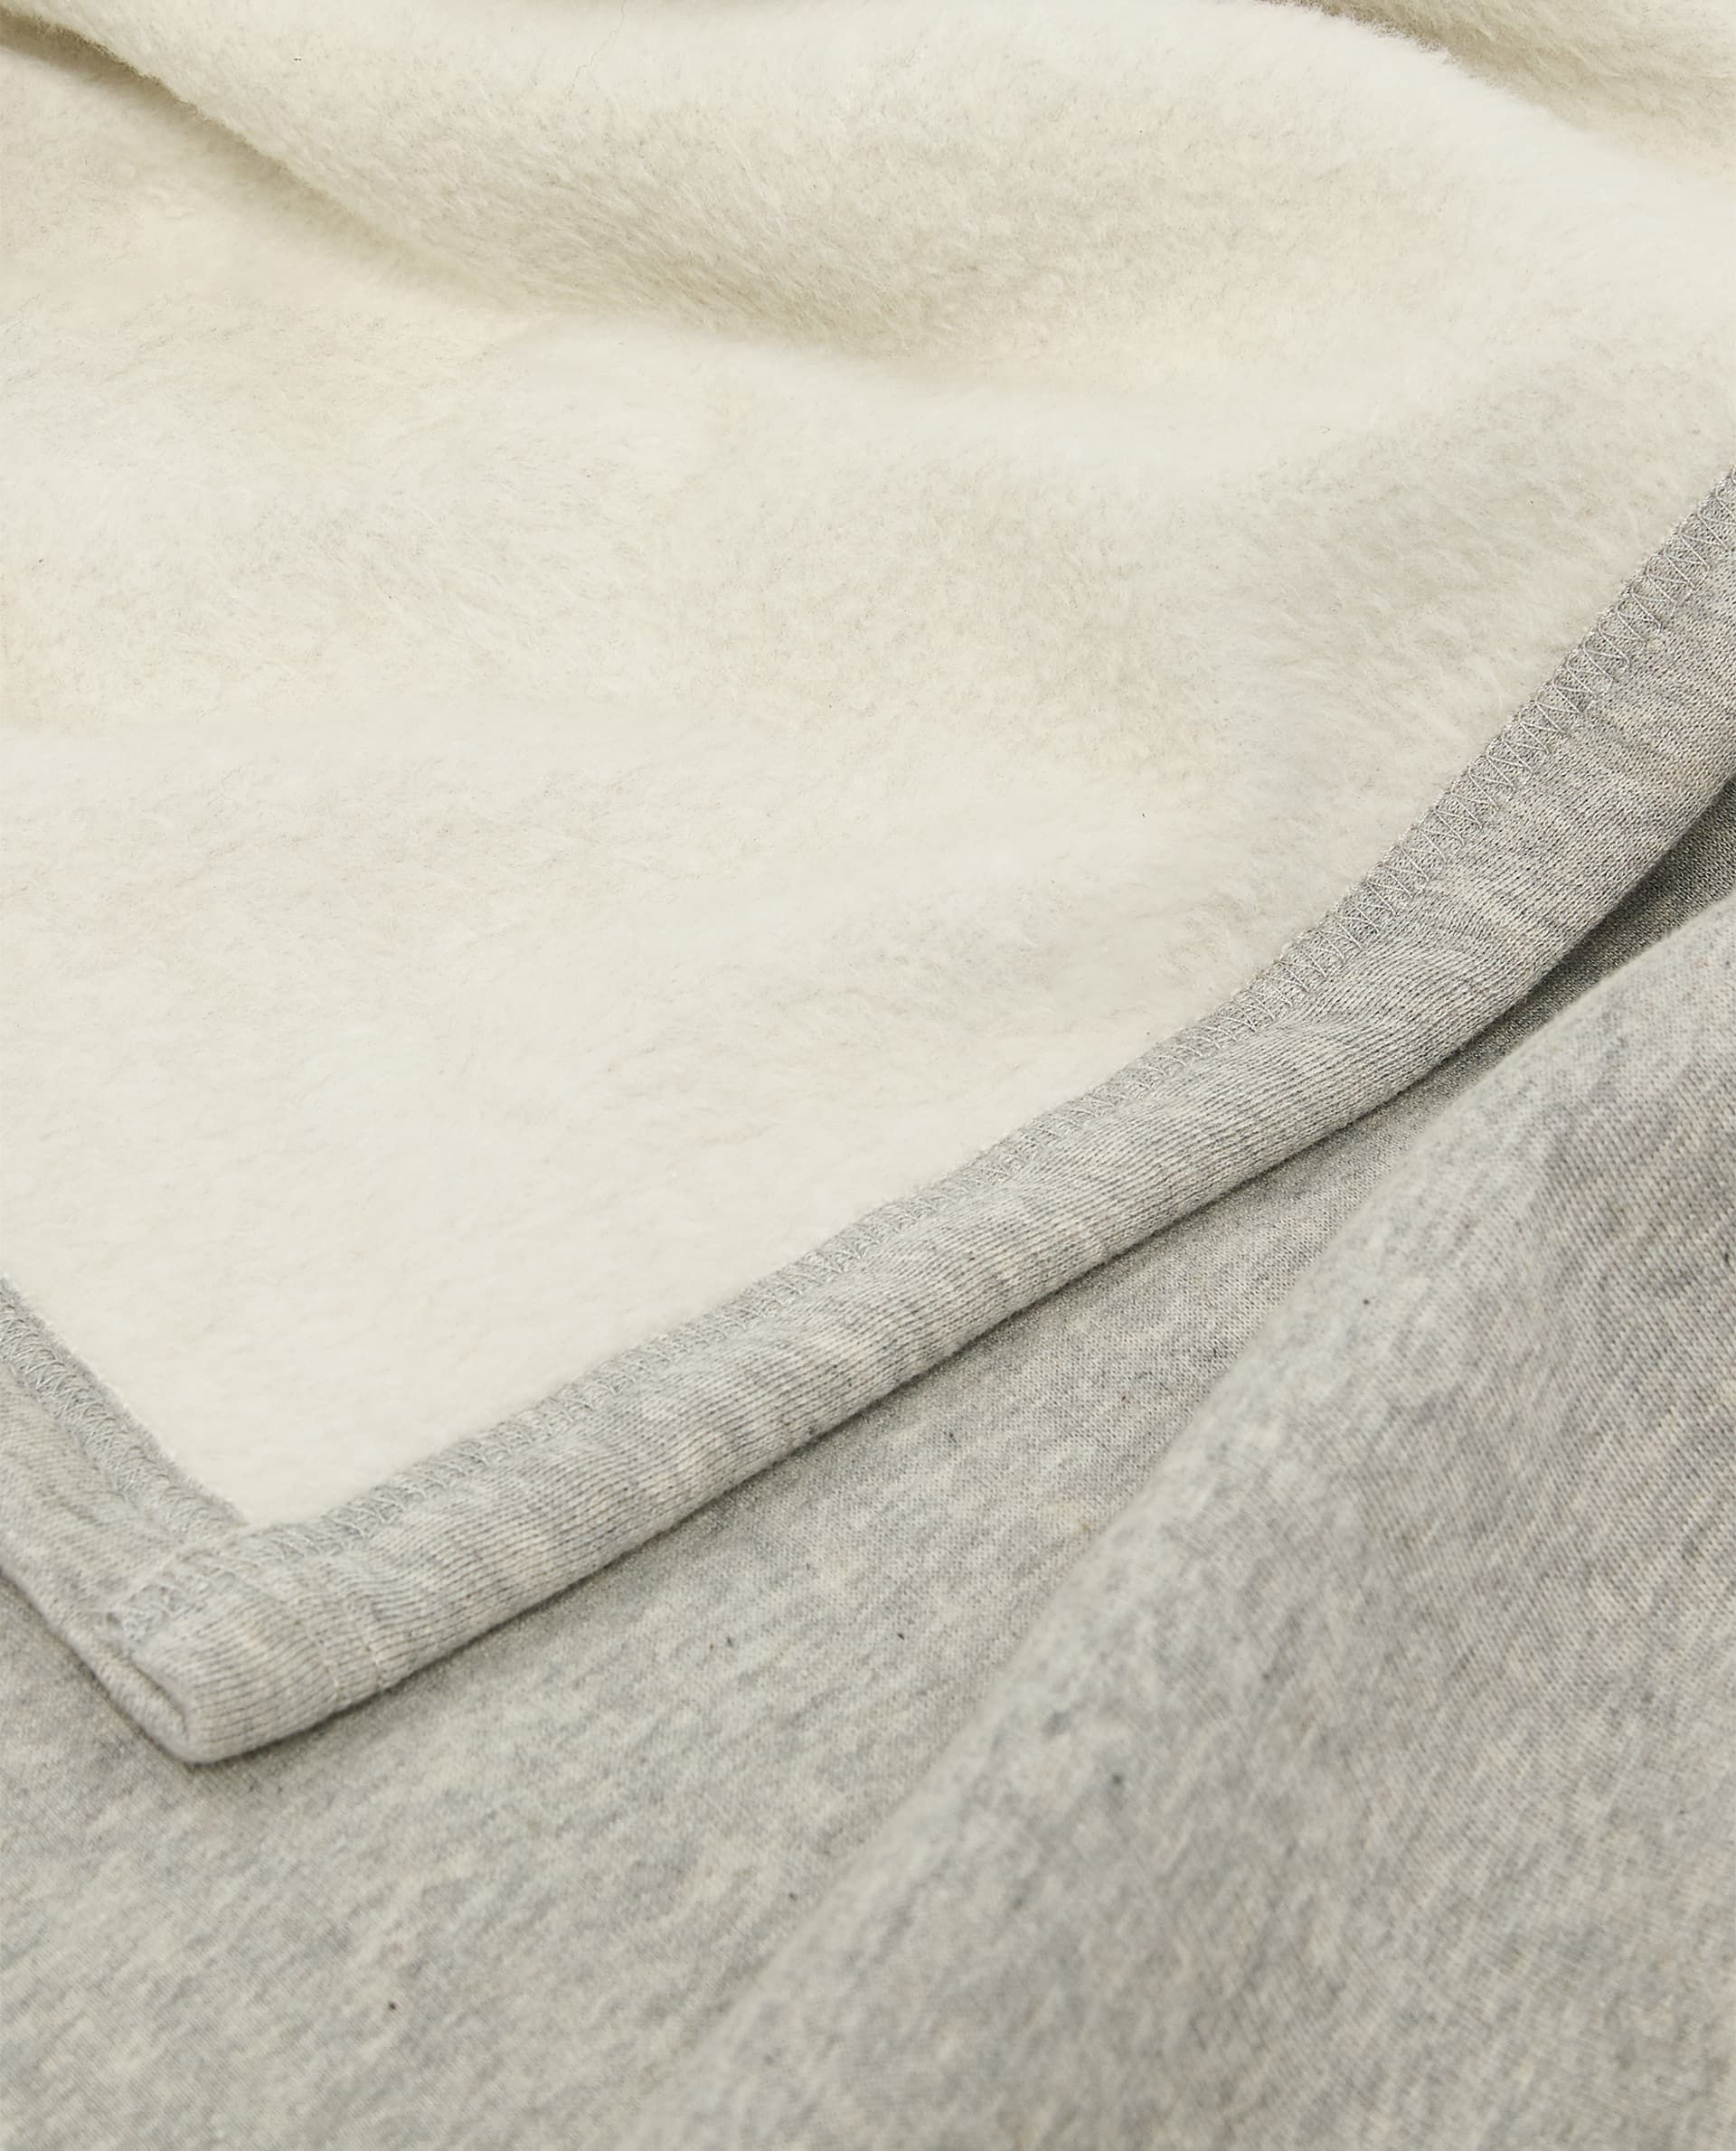 Cotton Jersey Blanket Blankets Bedroom Zara Home Saudi Arabia Zara Home Cotton Zara